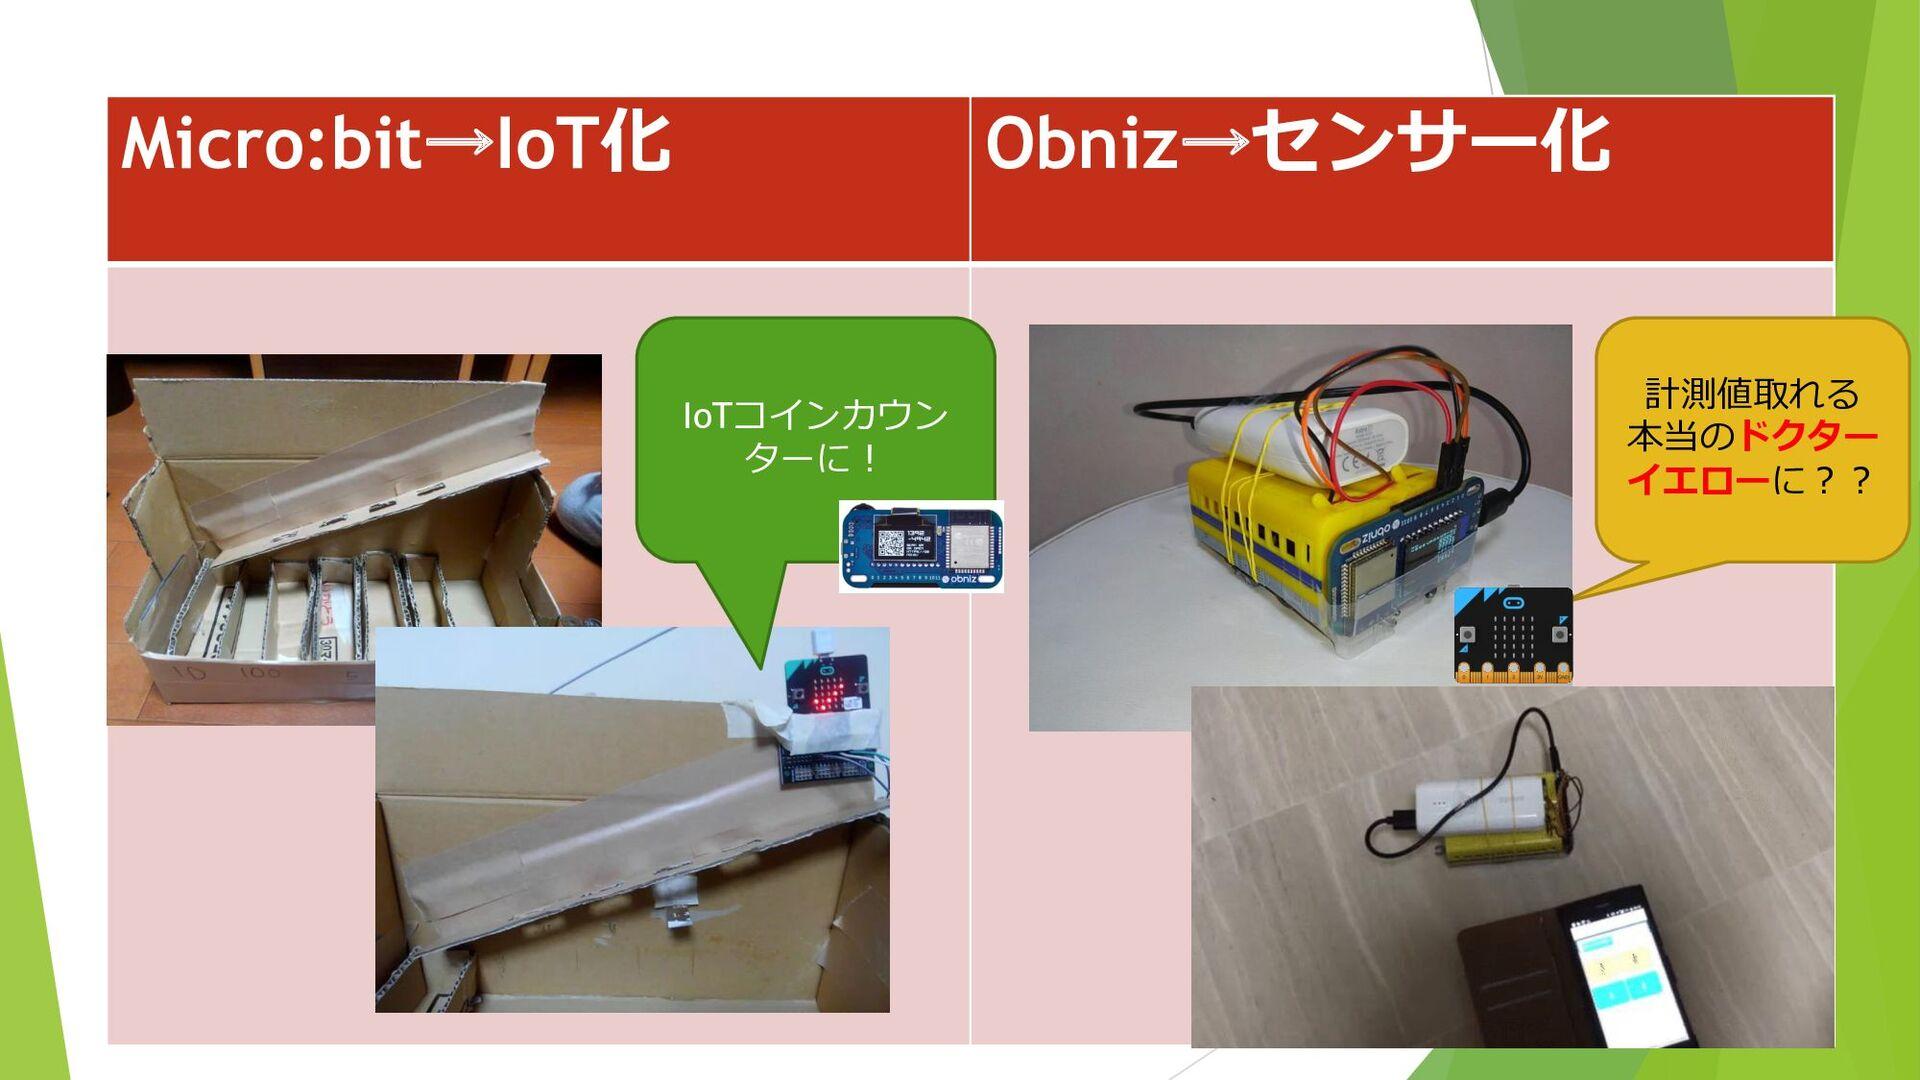 obnizの拡張センサーとして使用  micro:bit→ (シリアル通信) →obniz→...